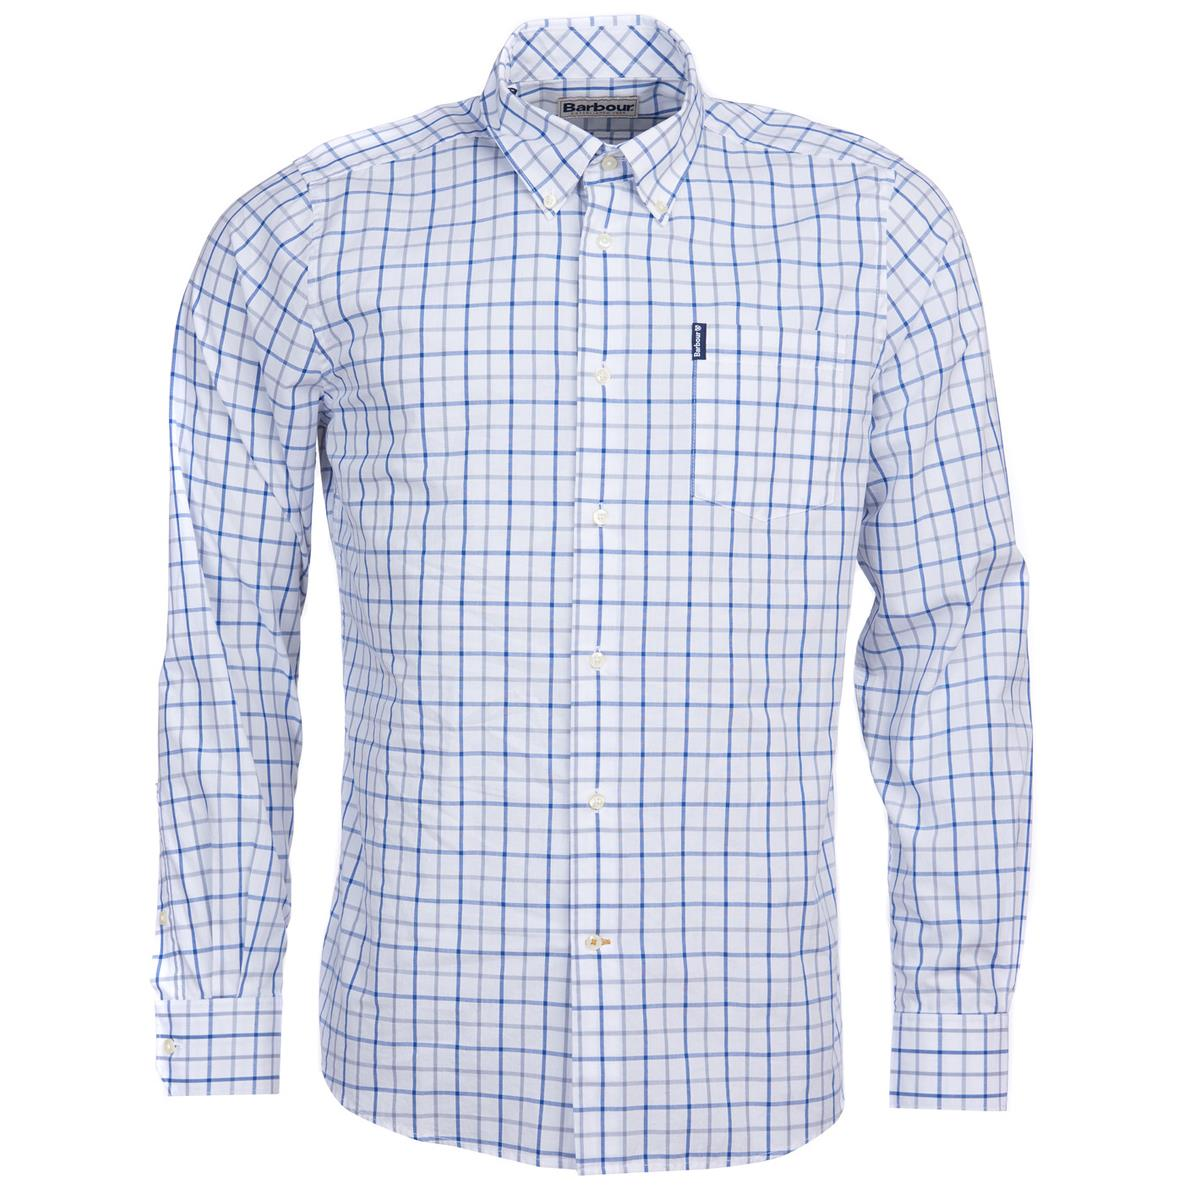 Men's Tops Barbour Tattersall 13 Tailored Shirt Mid Blue XXL